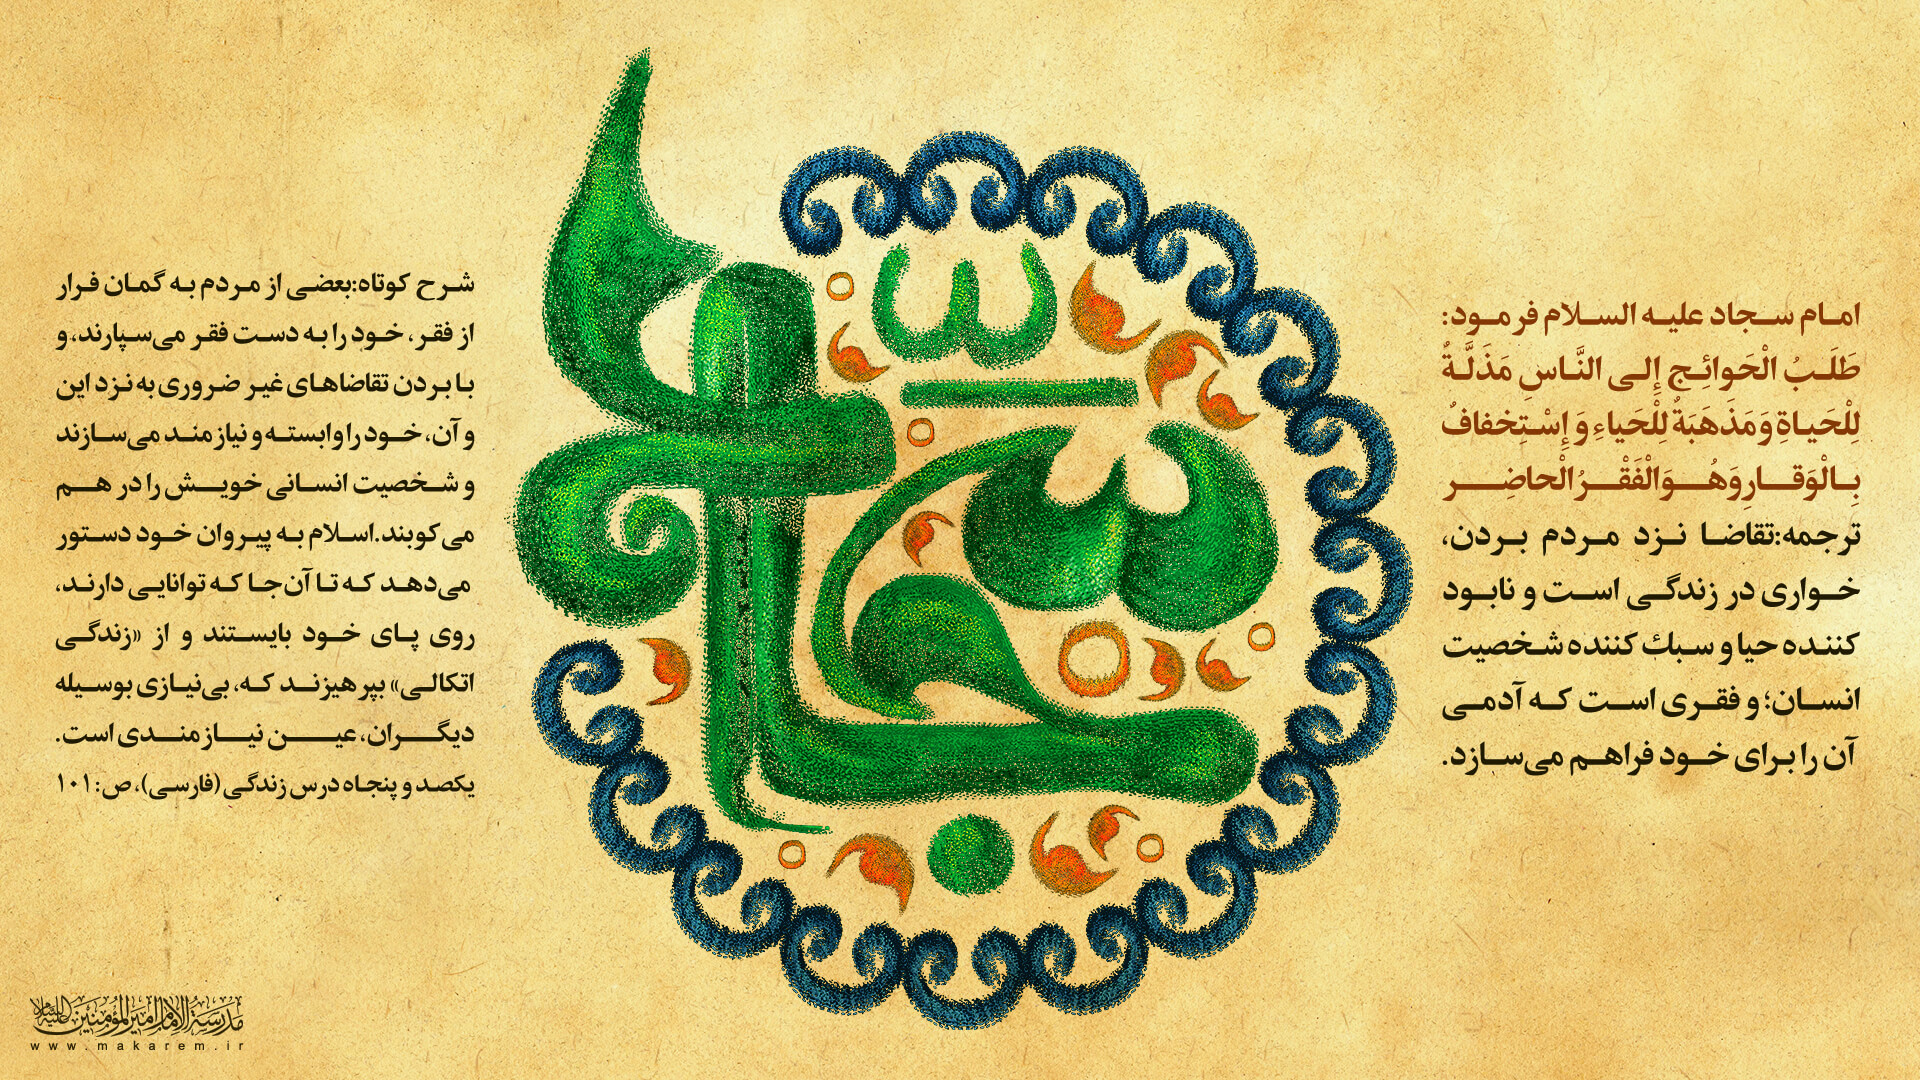 امام سجاد 02-مدرسه الامام امیر المومنین (ع)